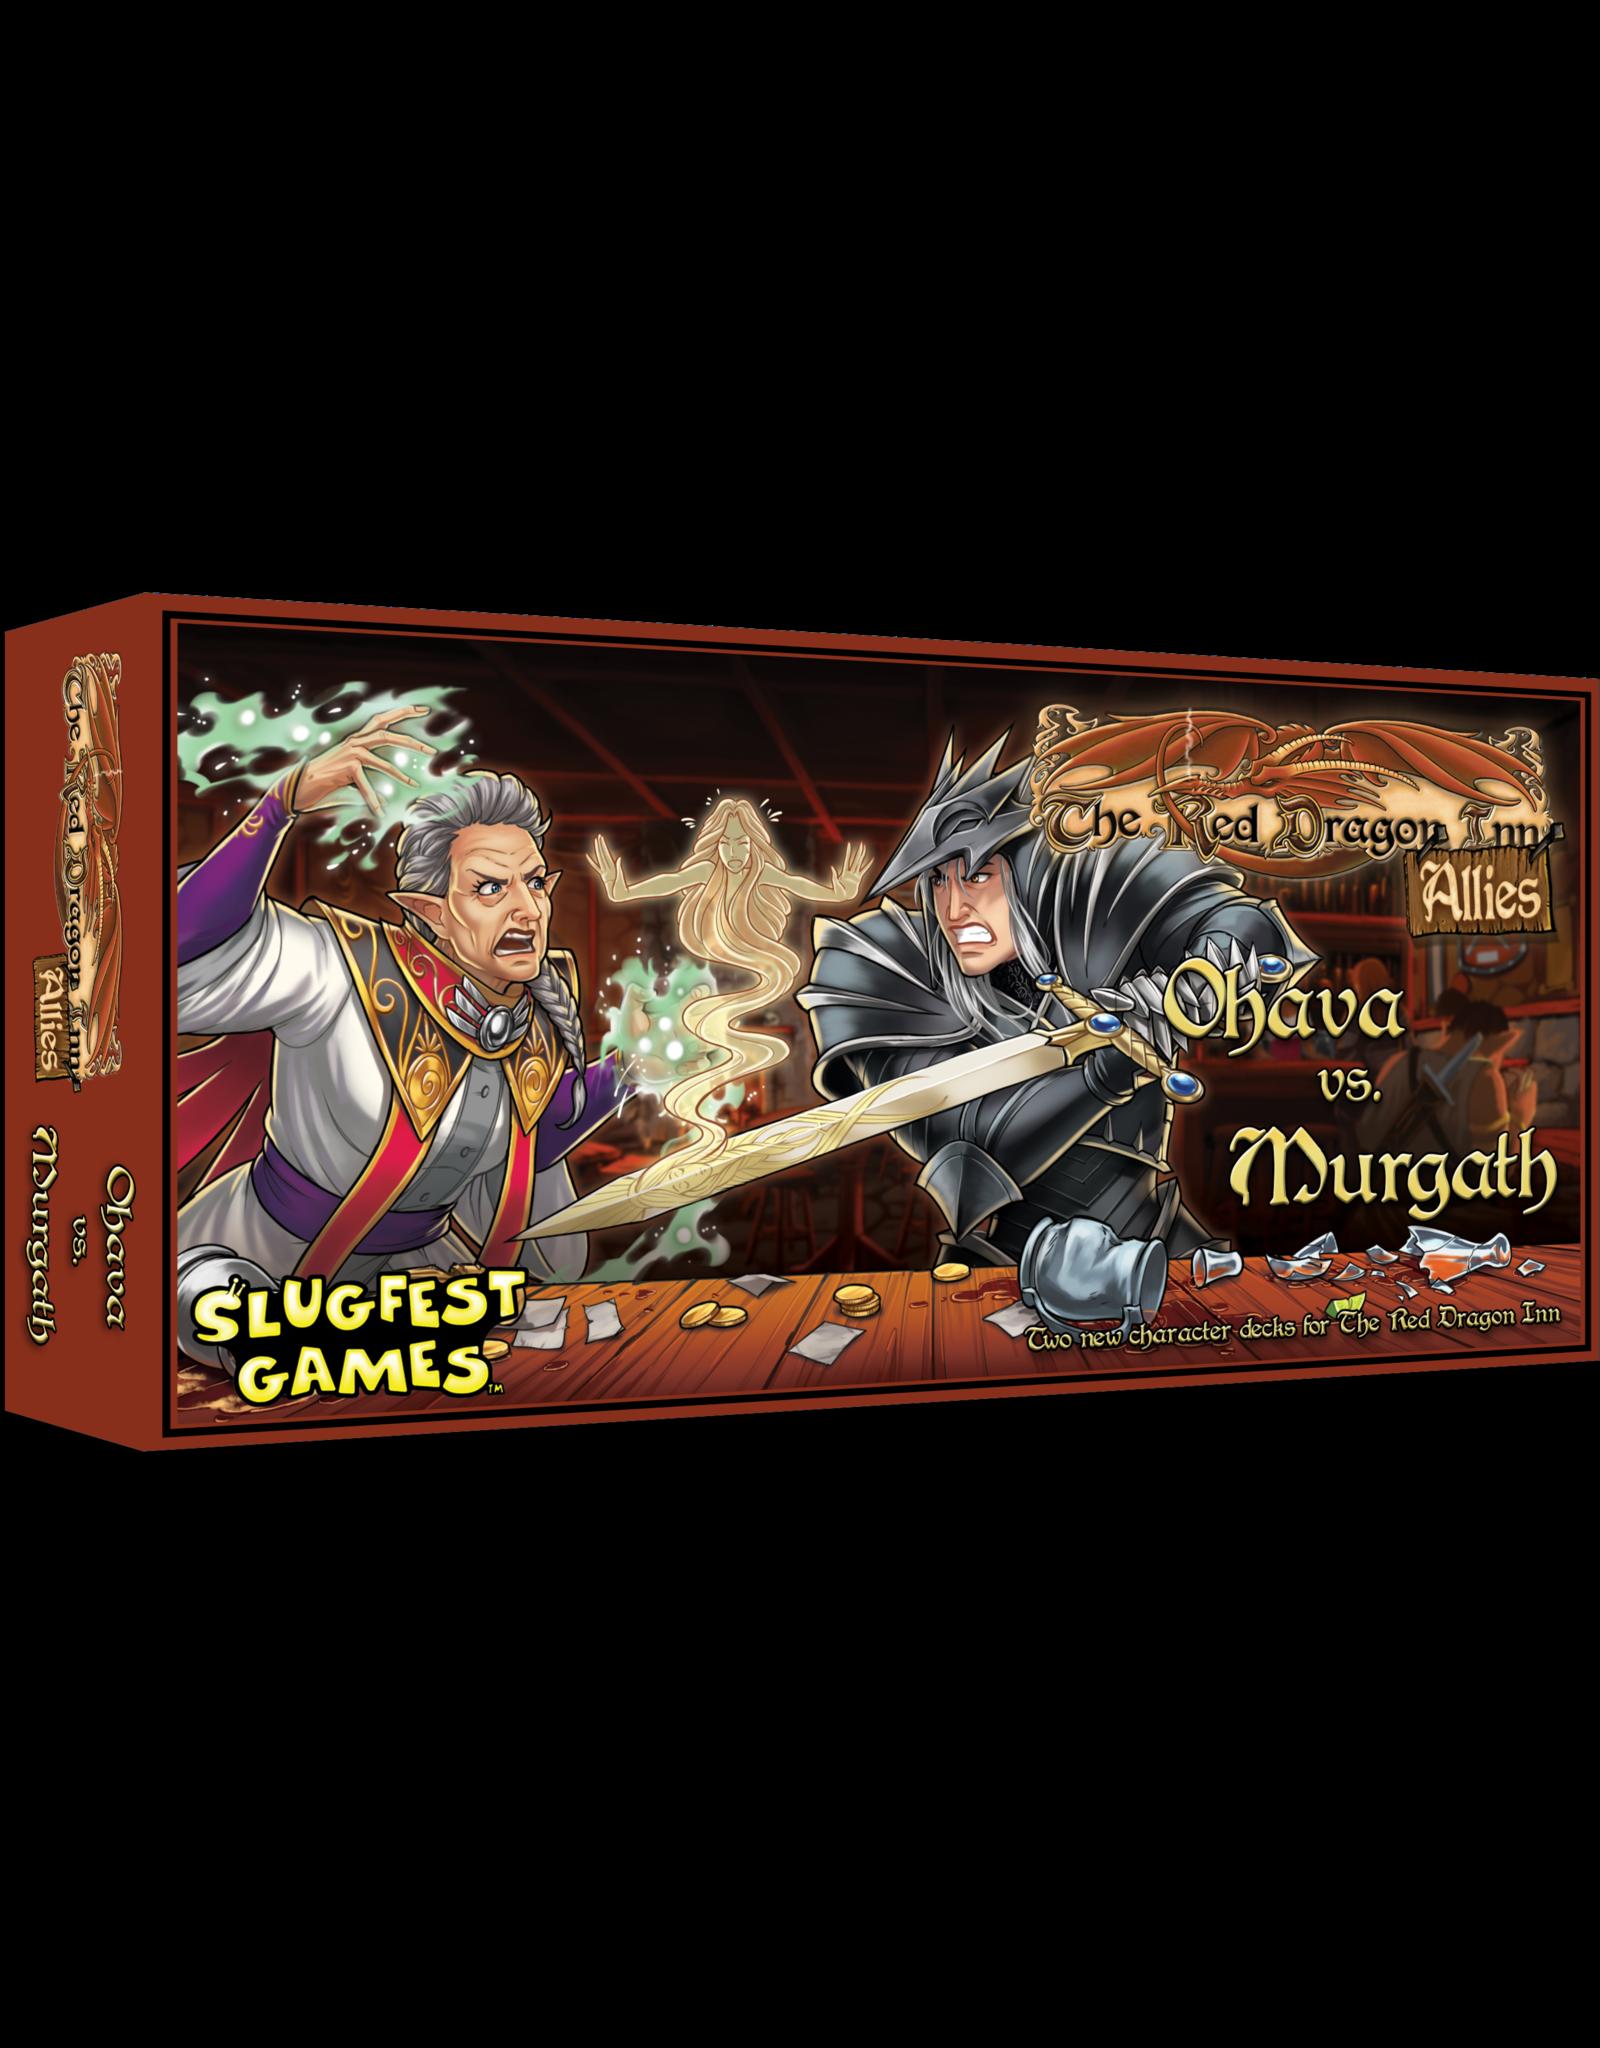 Slugfest Games Red Dragon Inn Allies - Ohava vs Murgath